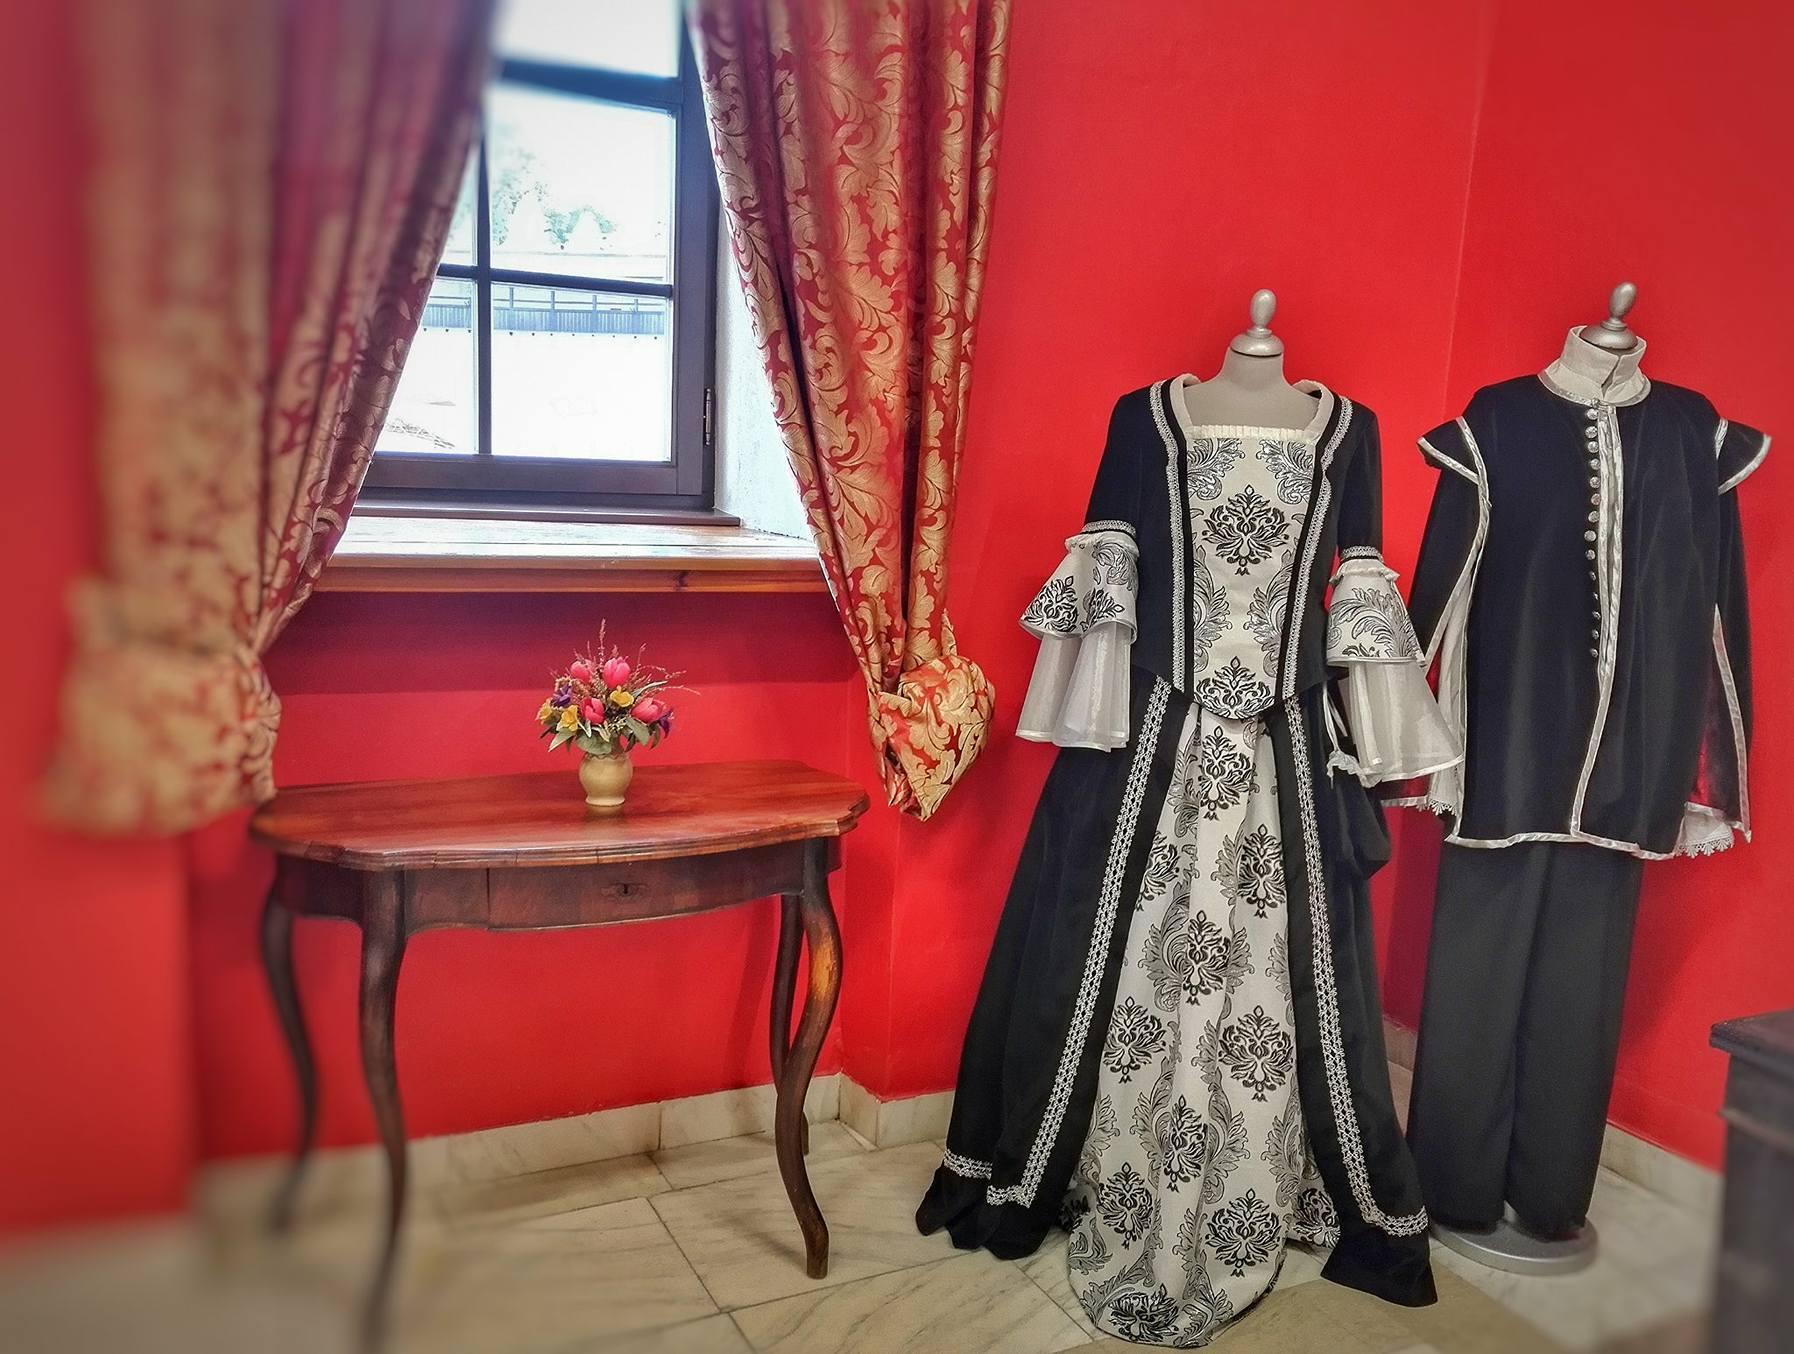 figuríny dobové oblečenie - múzeum v Kežmarku